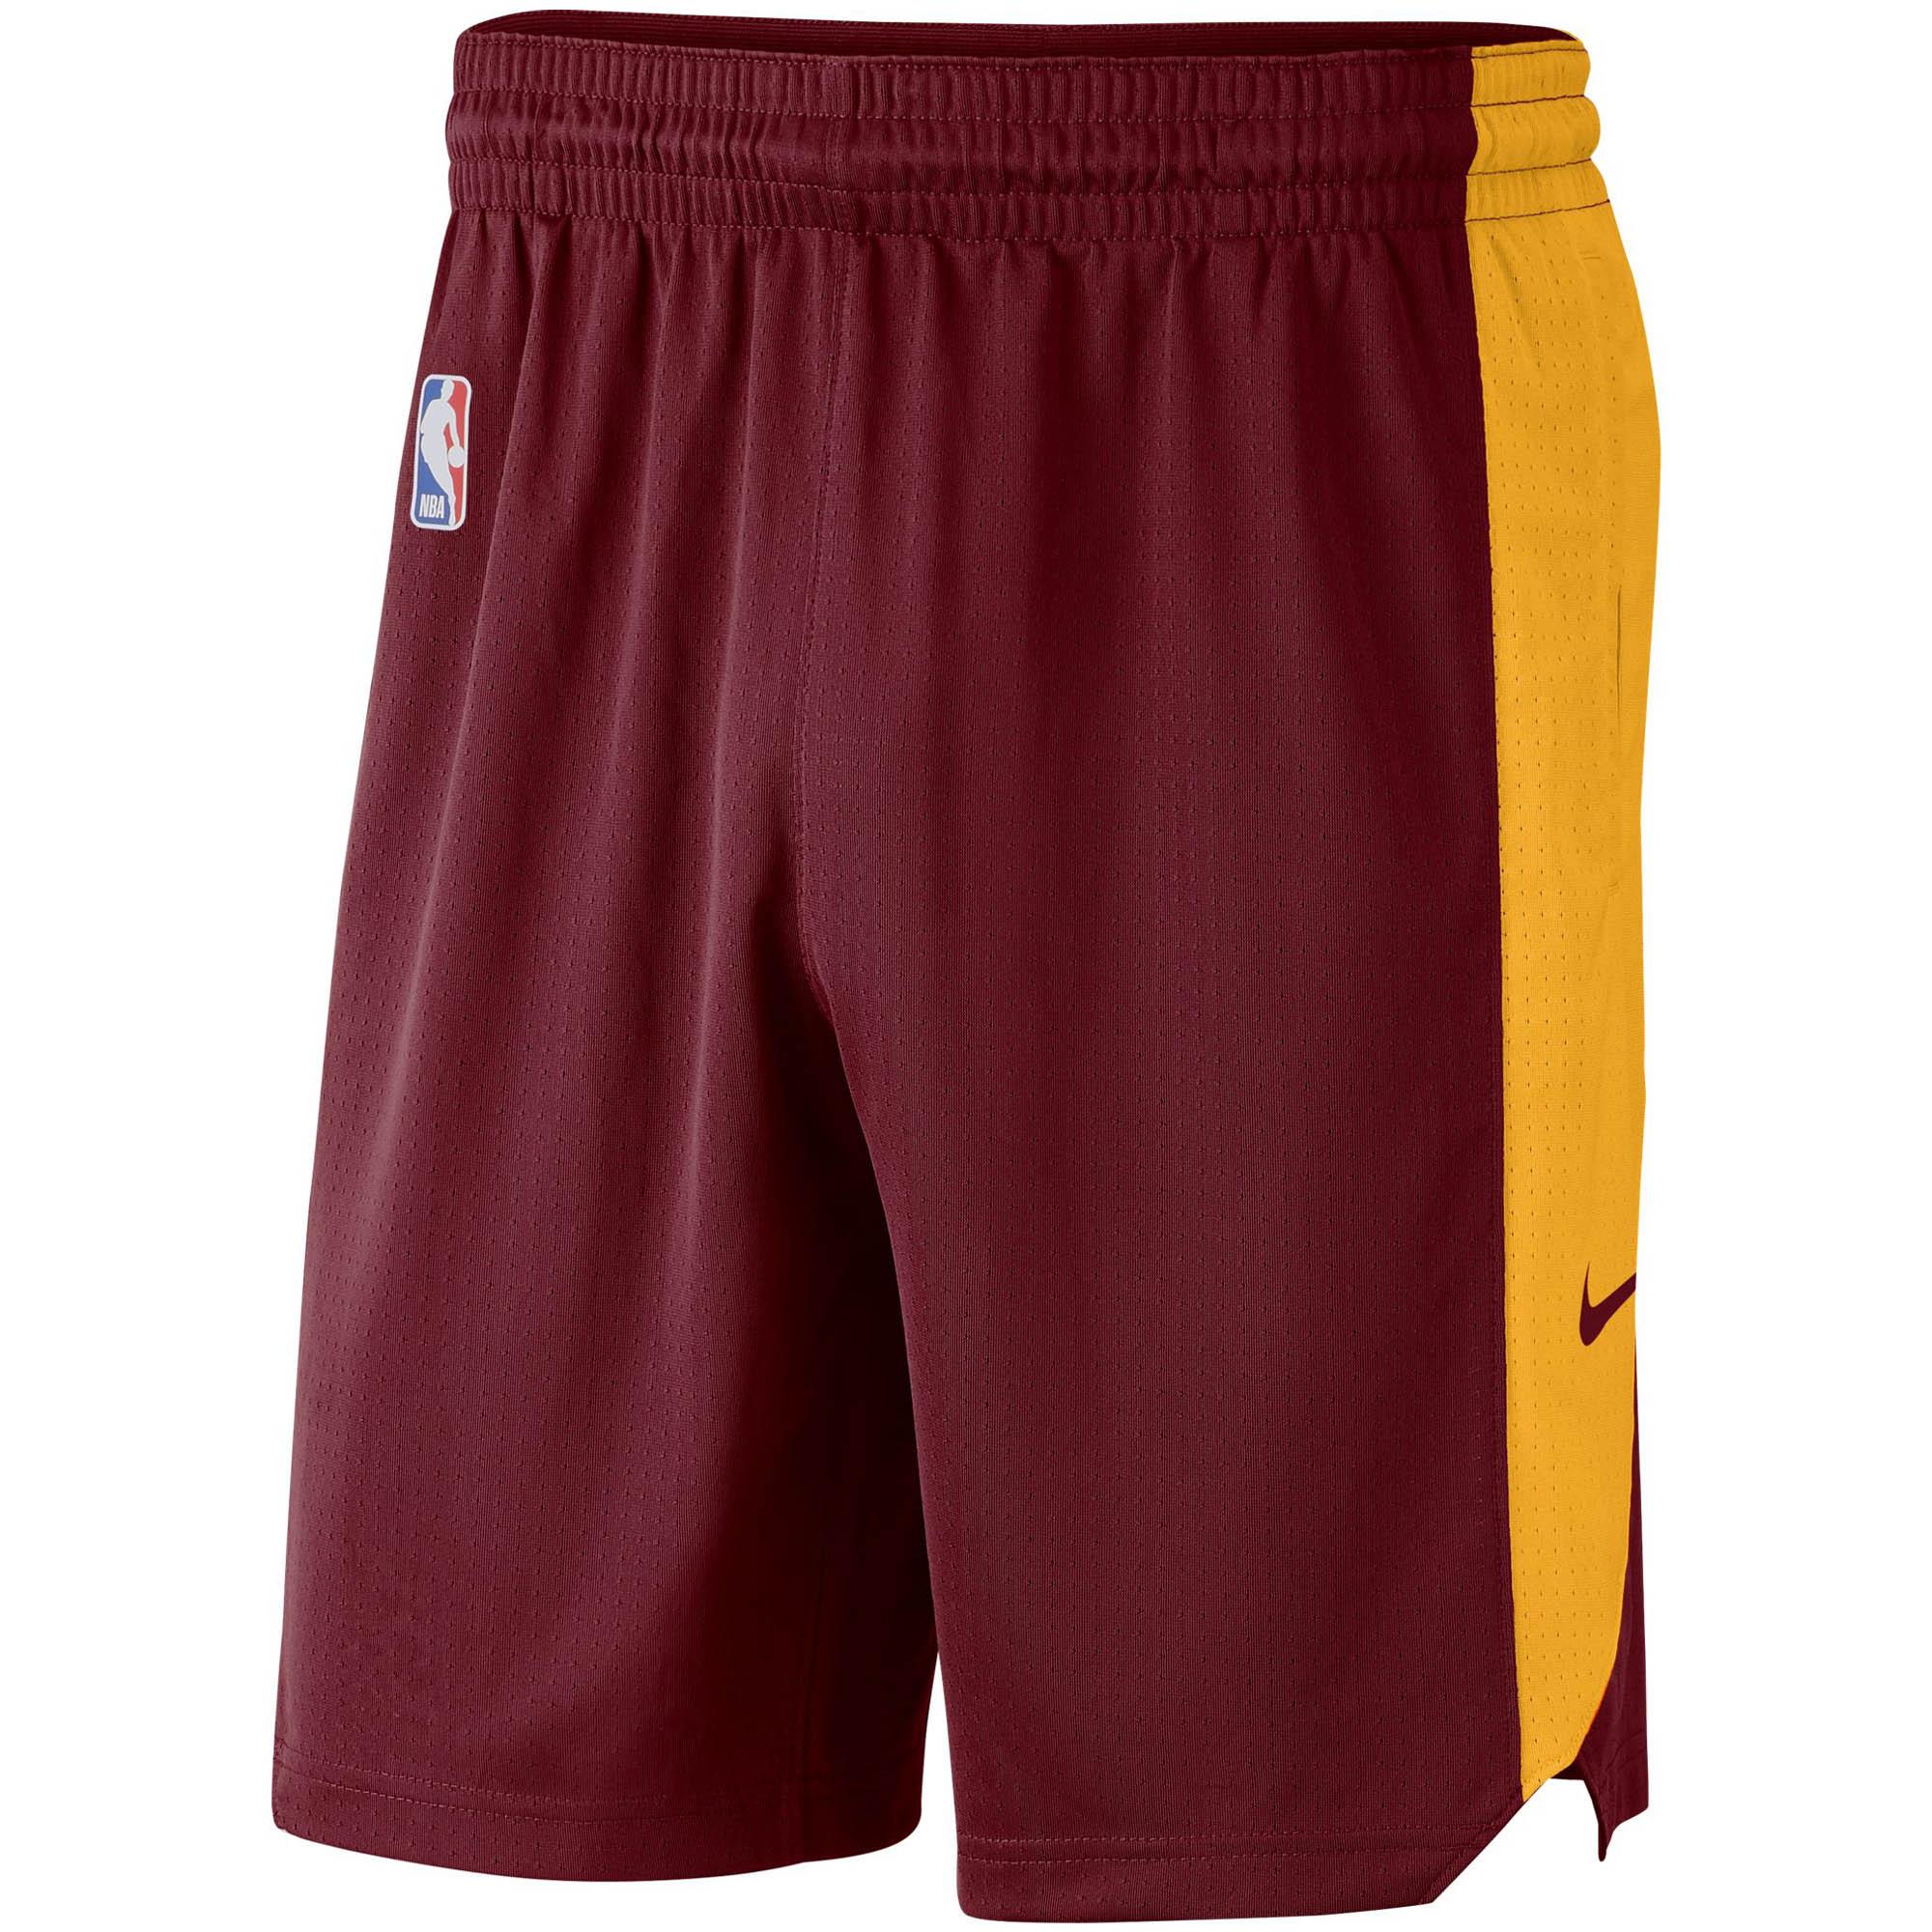 Cleveland Cavaliers Nike Performance Practice Shorts - Wine